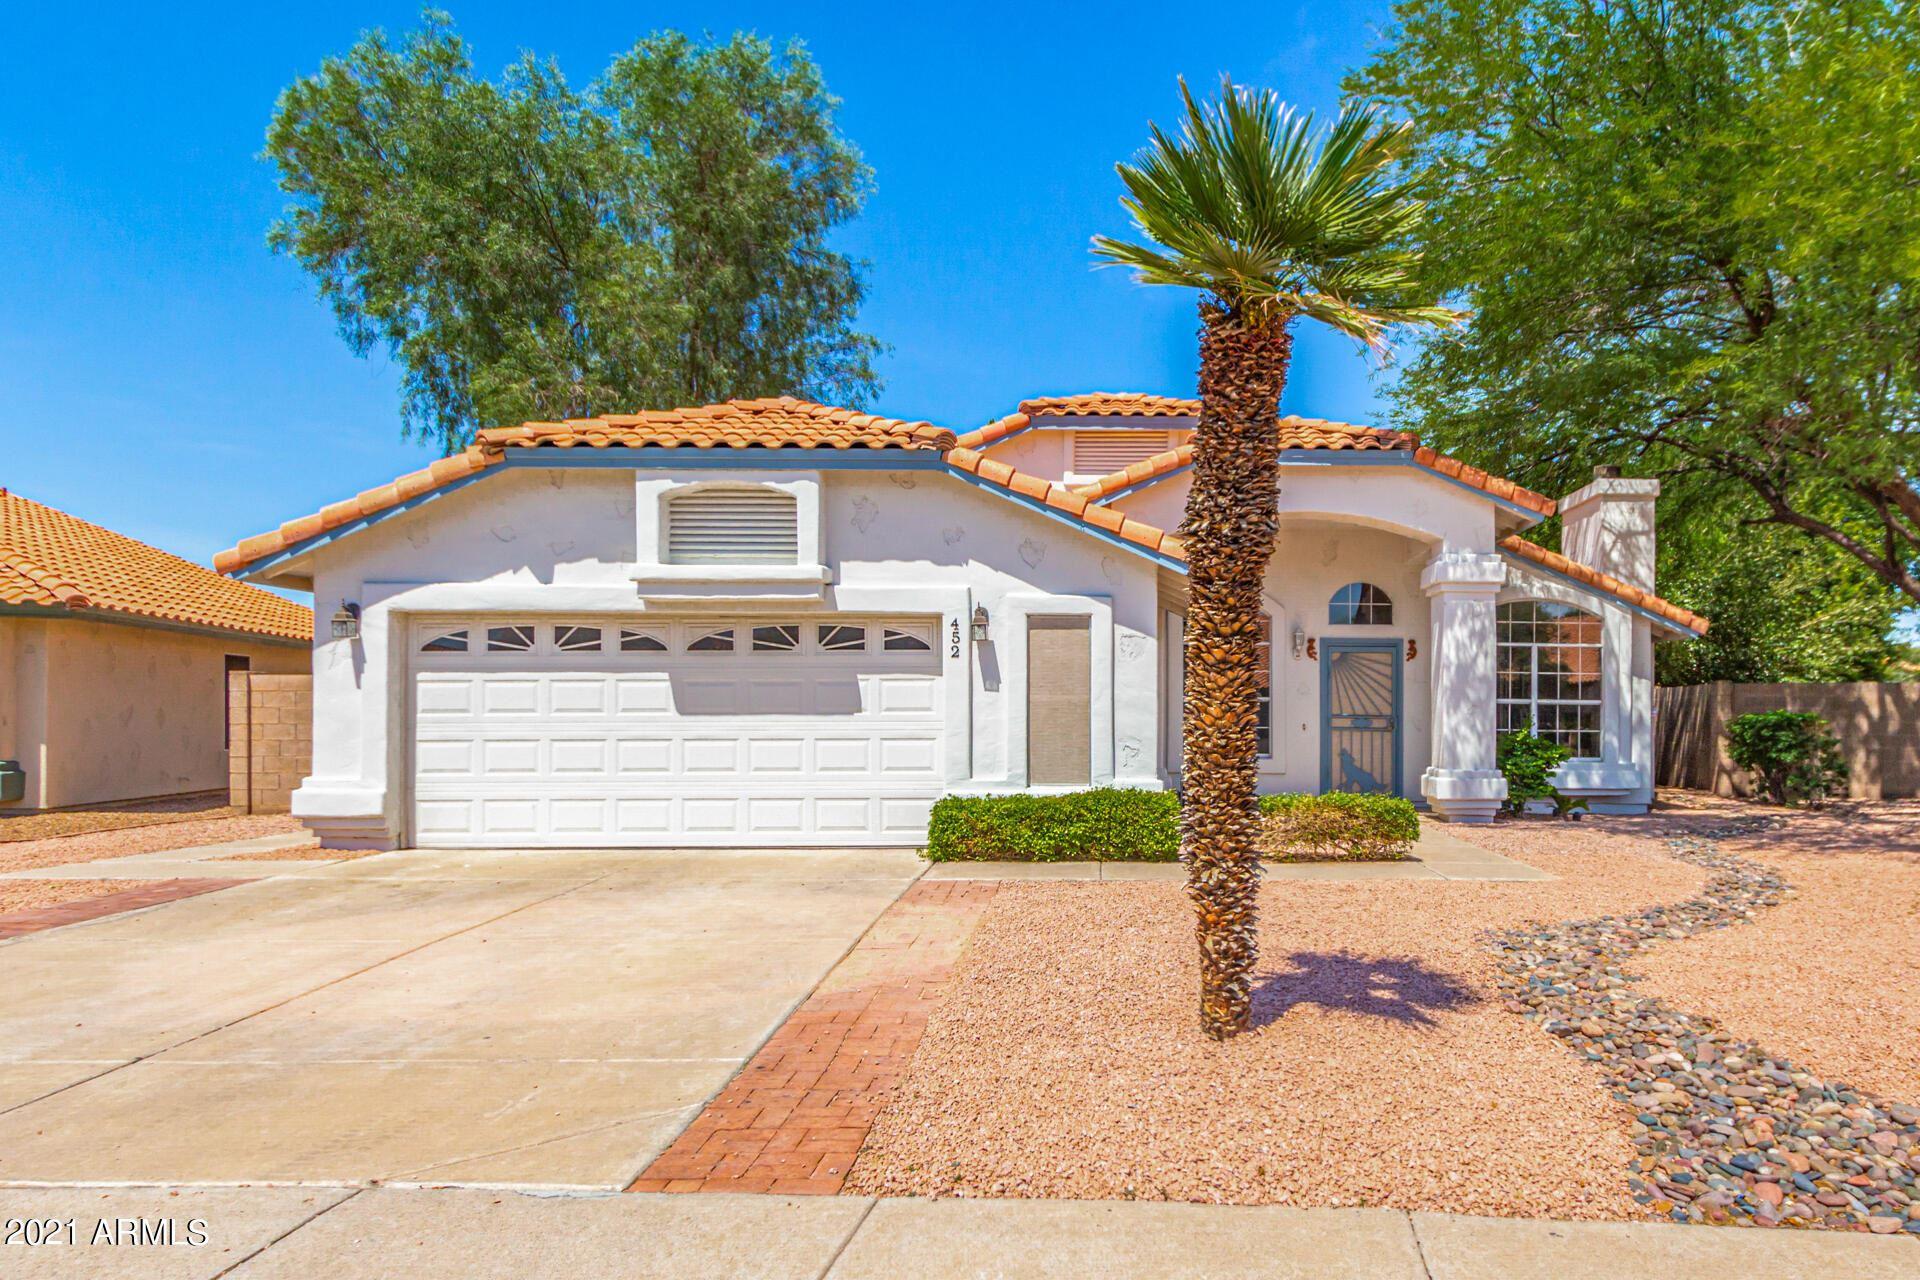 452 W SAGEBRUSH Street, Gilbert, AZ 85233 - MLS#: 6271491